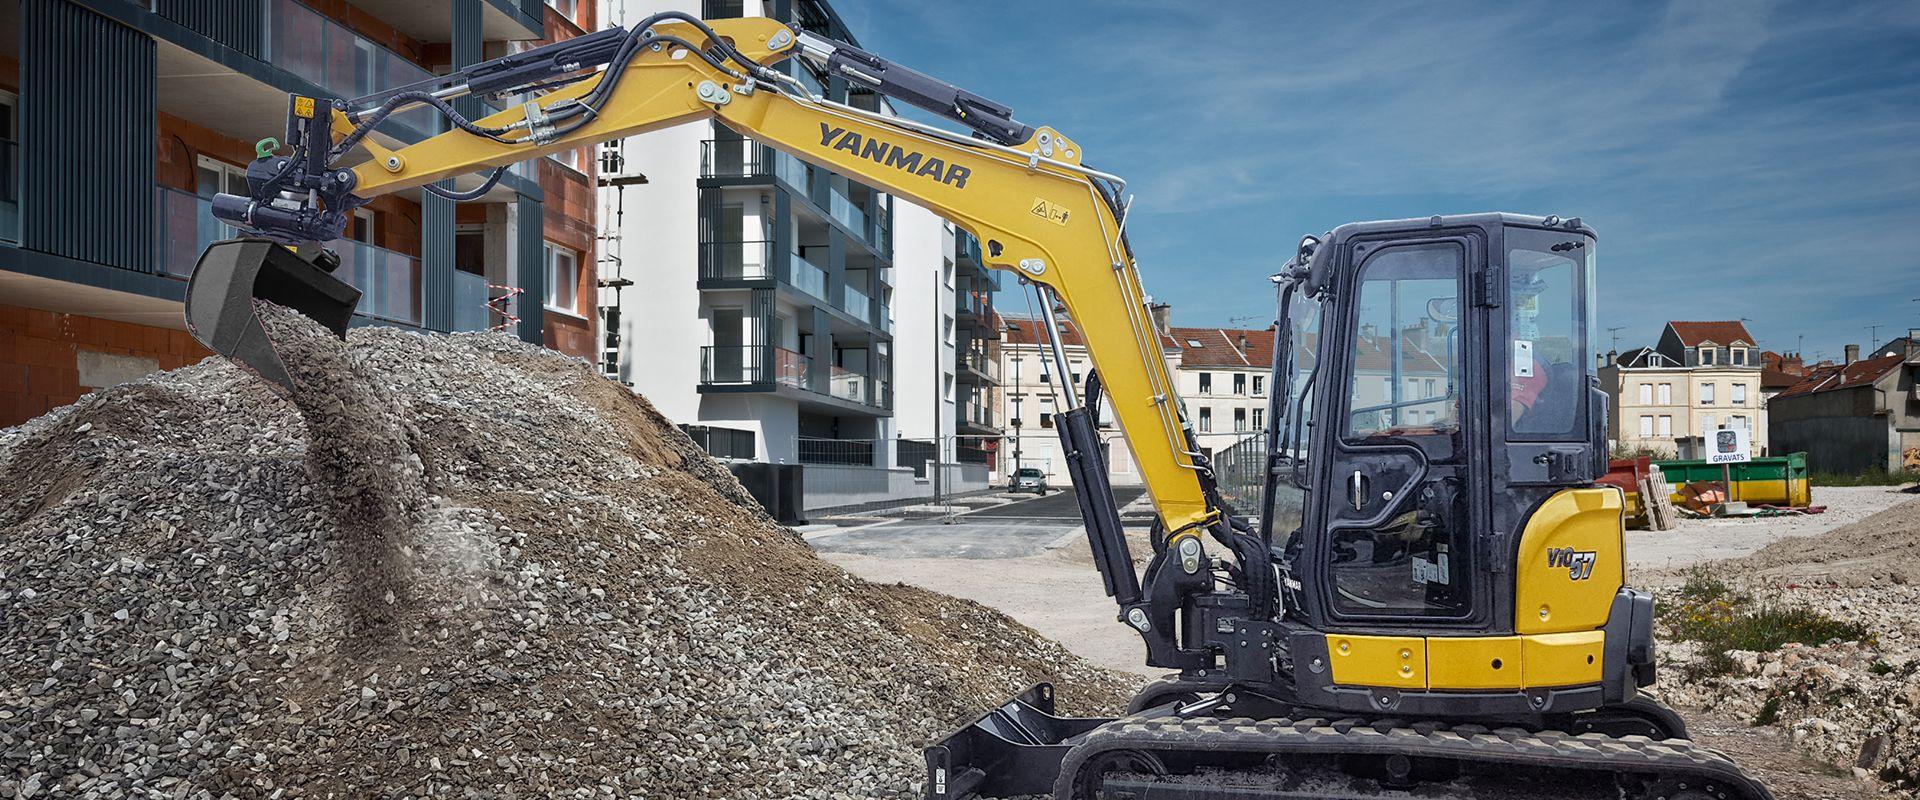 machine on construction site